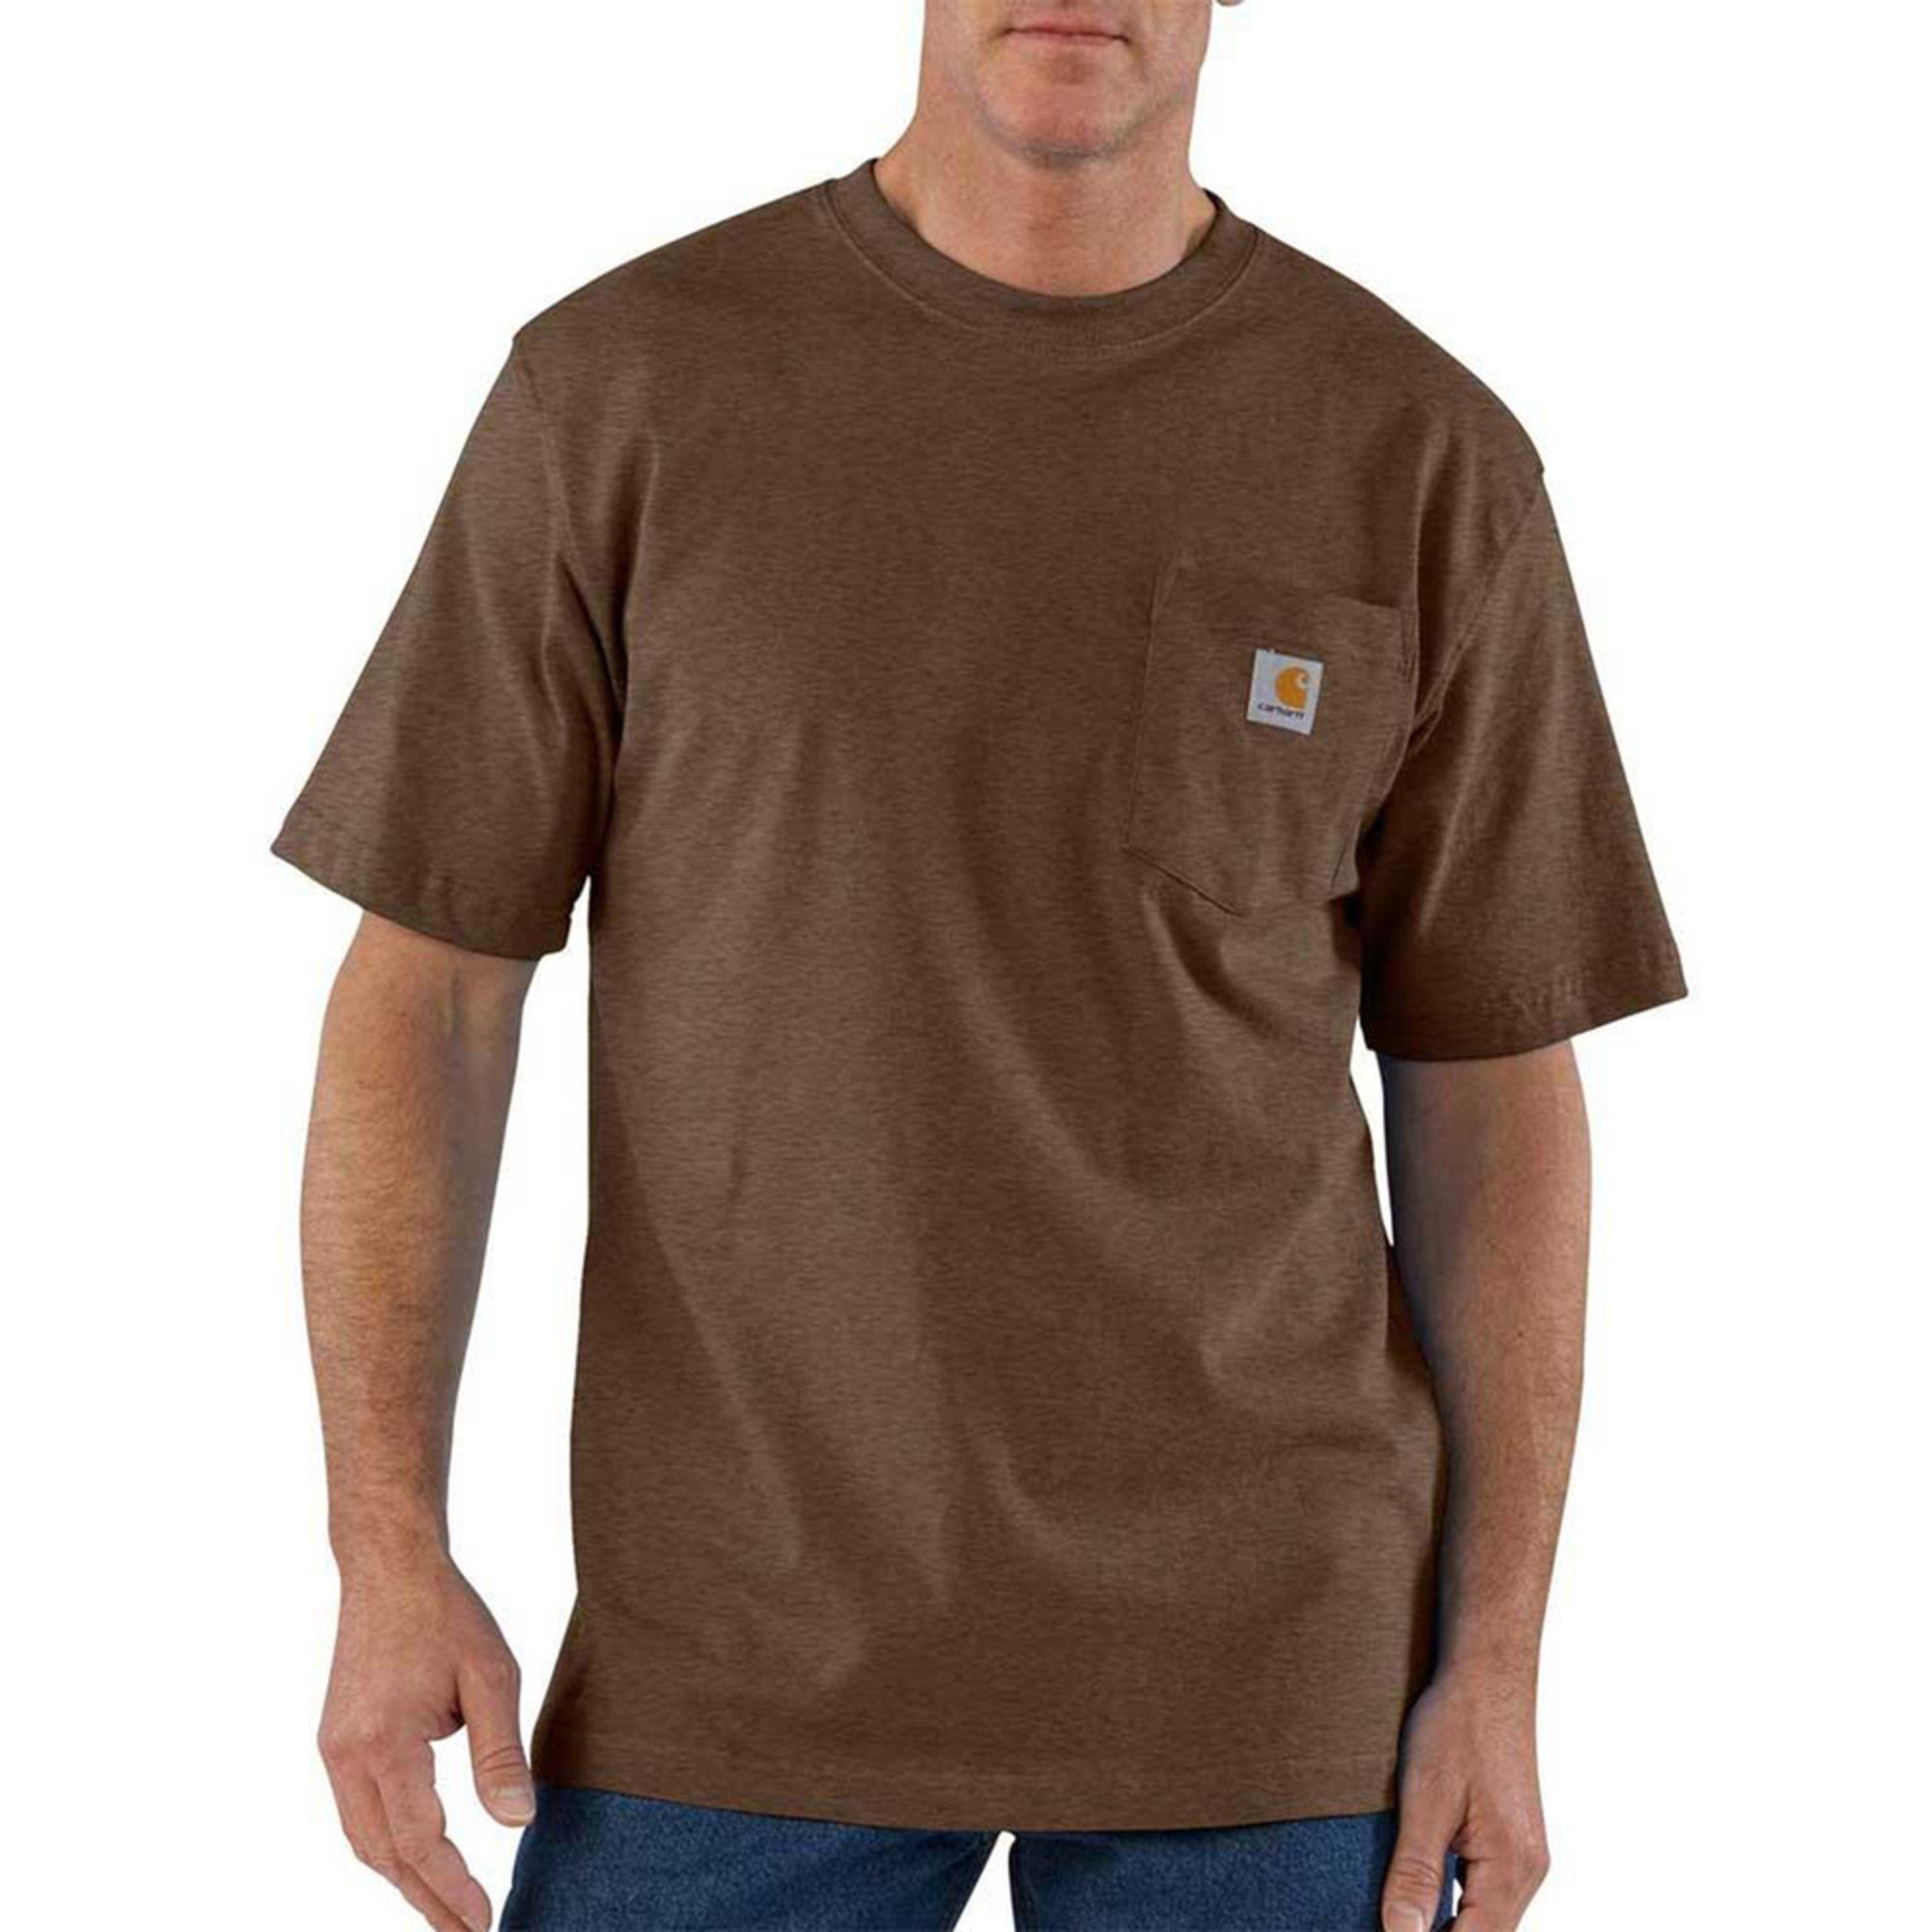 edd5b9708b7 Carhartt. Carhartt Men s Workwear Pocket Short Sleeve Tee